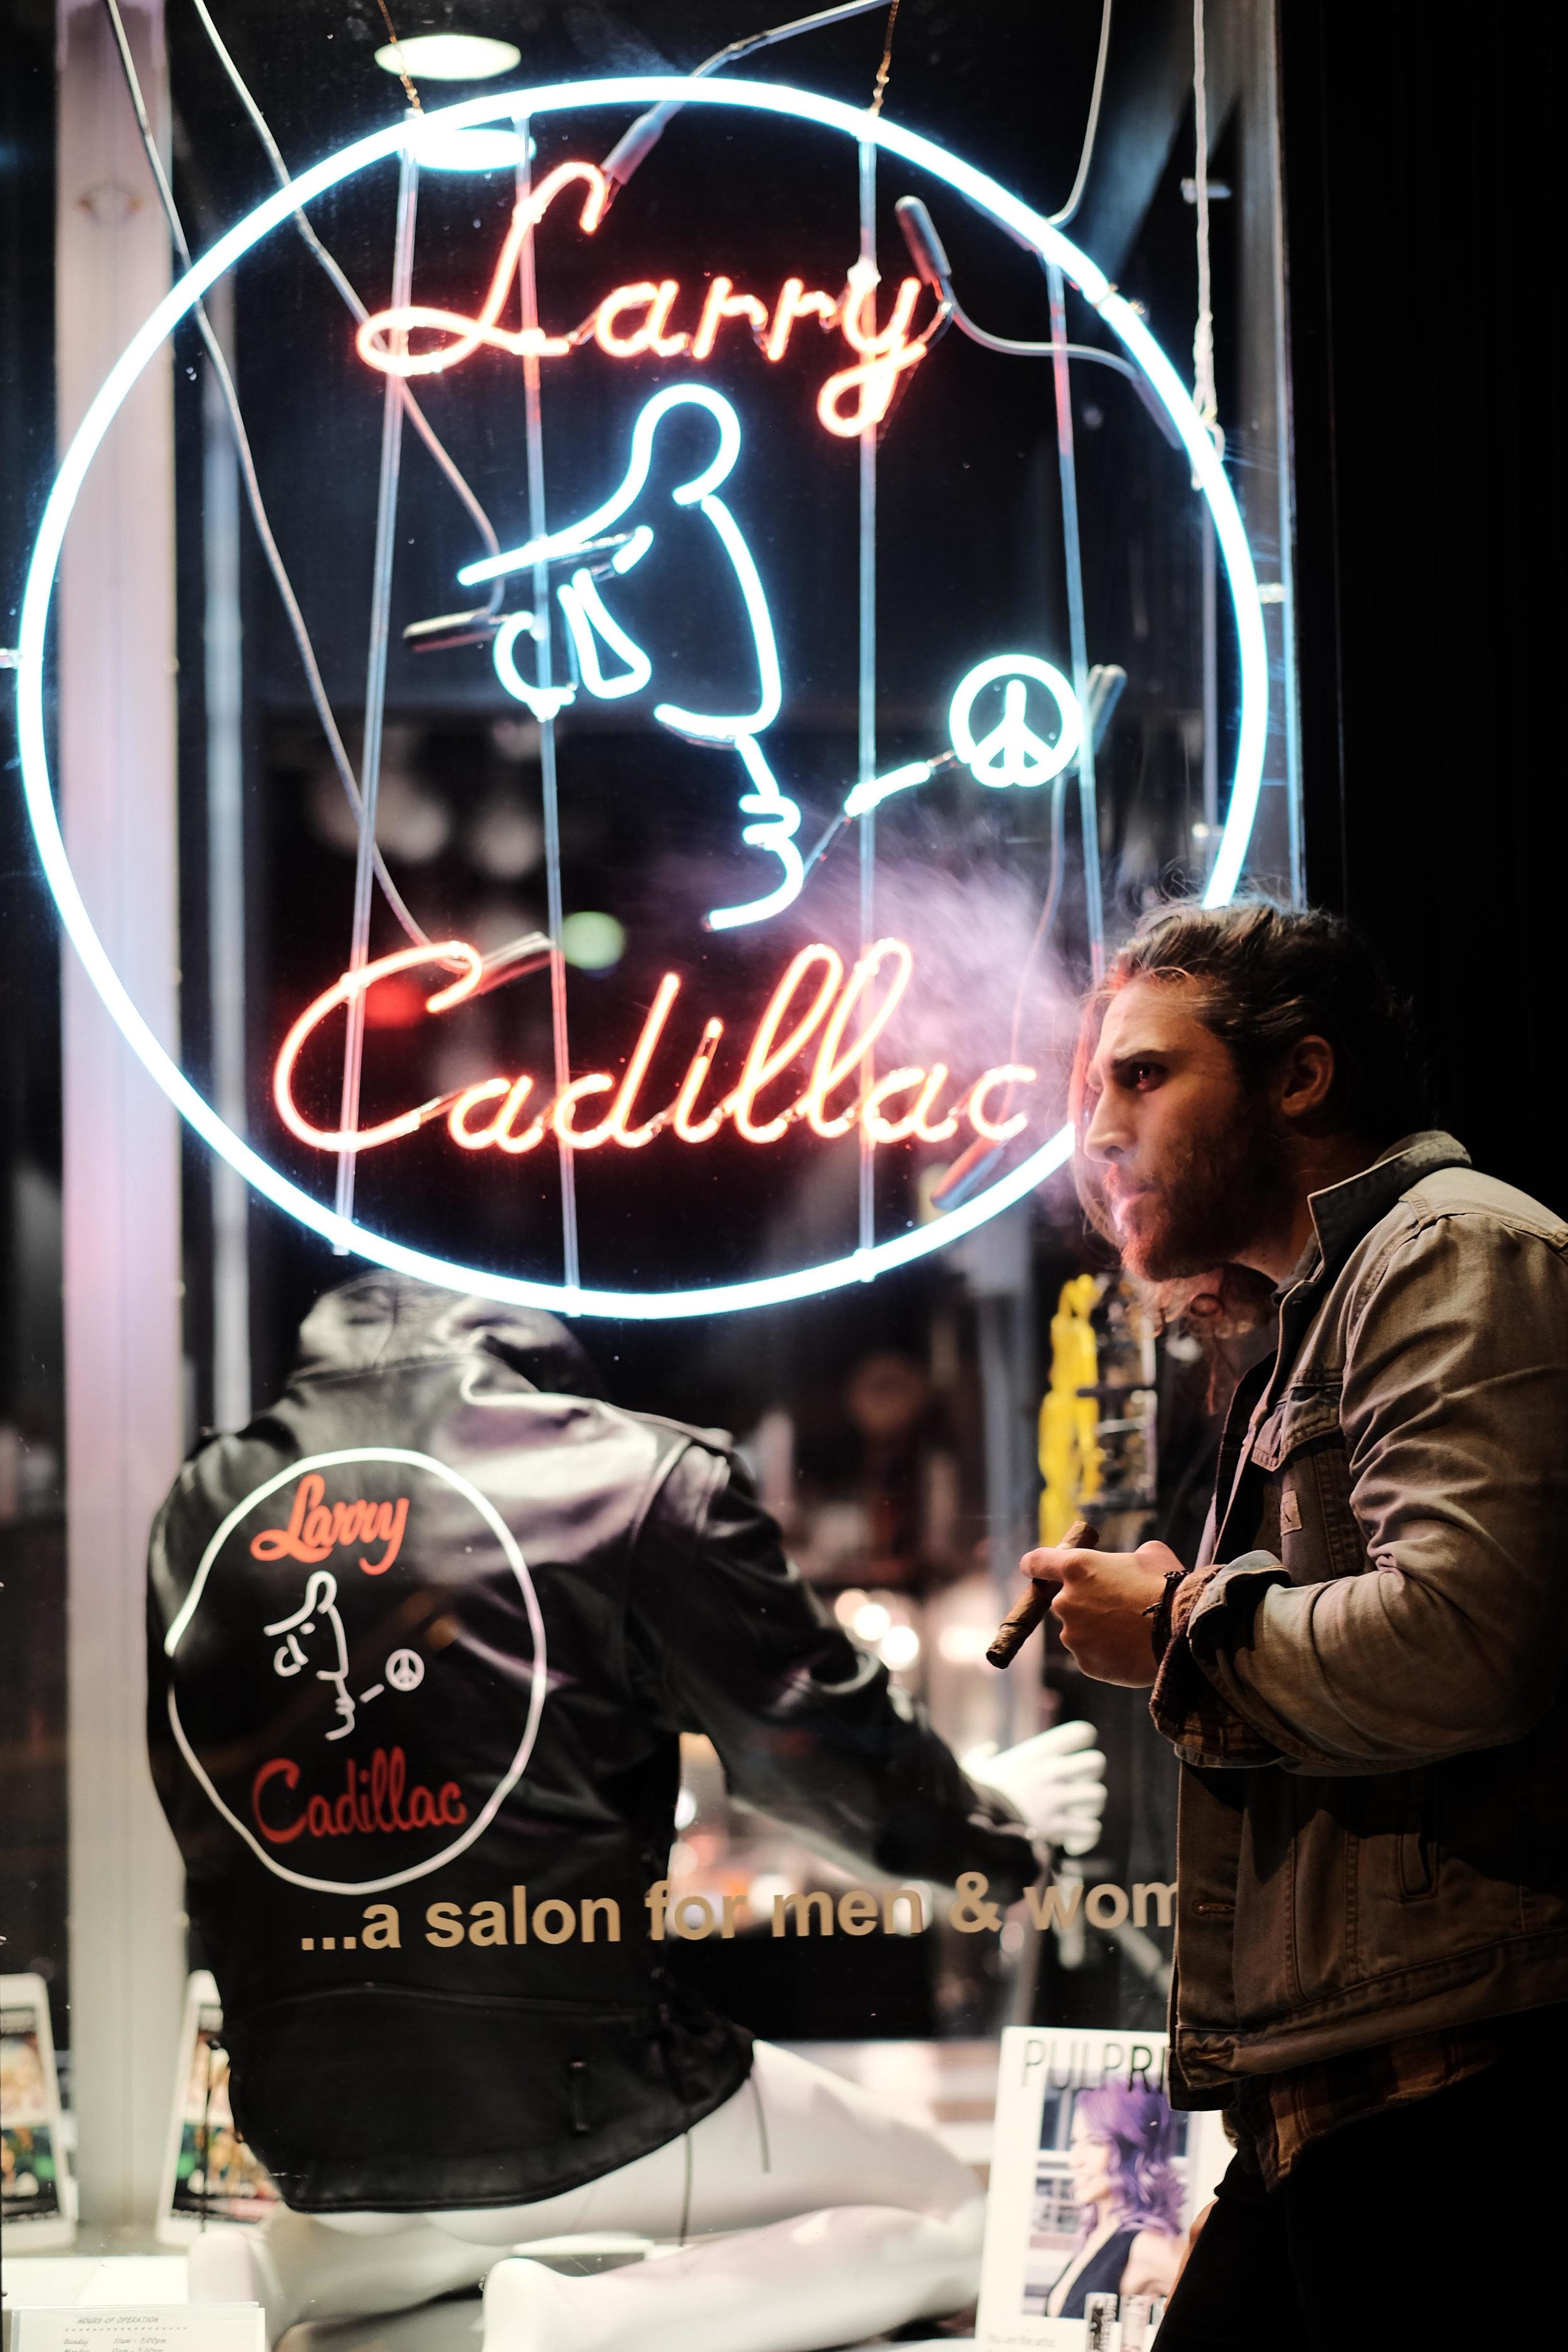 Larry Cadillac: A Salon For Men & Women